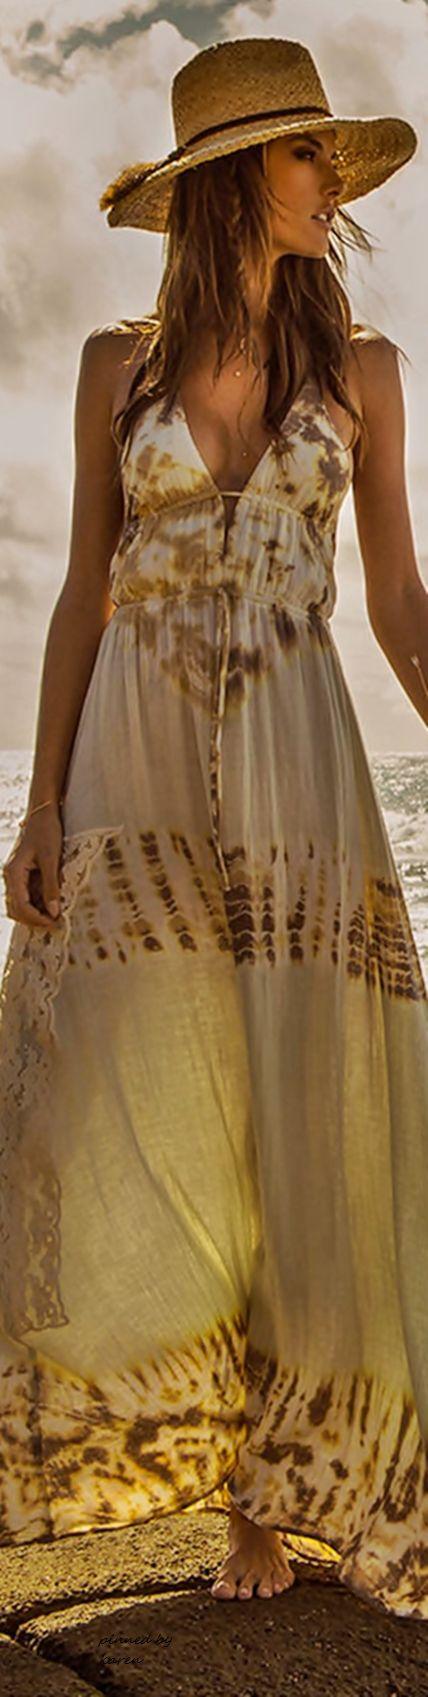 Boho Style ~ bohemian boho style hippy hippie chic bohème vibe gypsy fashion indie folk dress